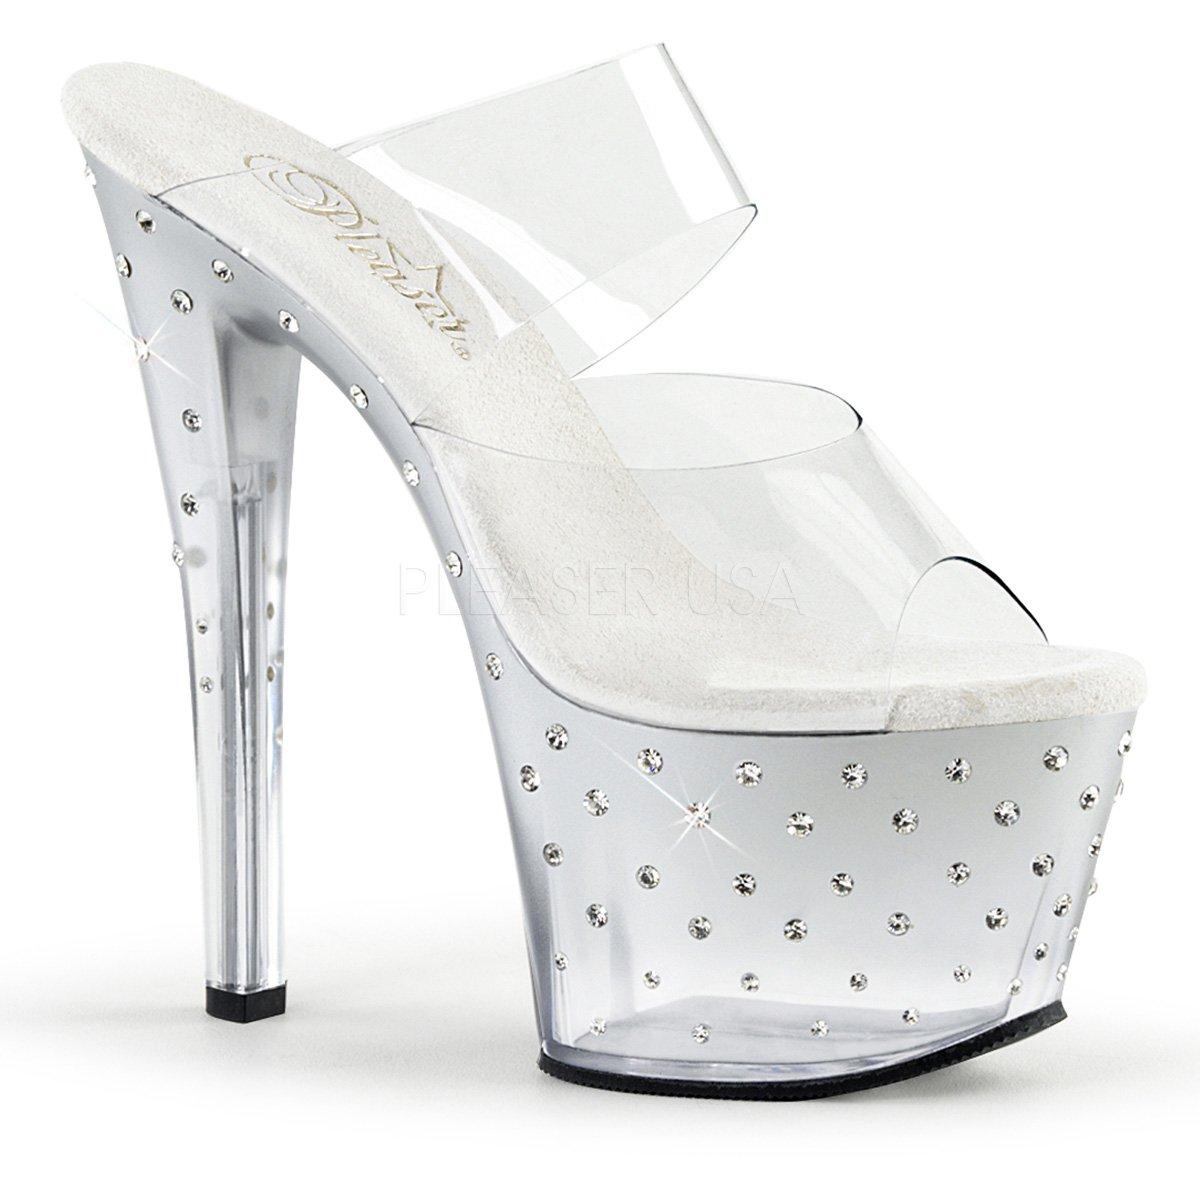 Pleaser Women's Stdus702t/c/s-c Platform Sandal B06Y1JN93X 10 B(M) US|Clr/Slv-clr